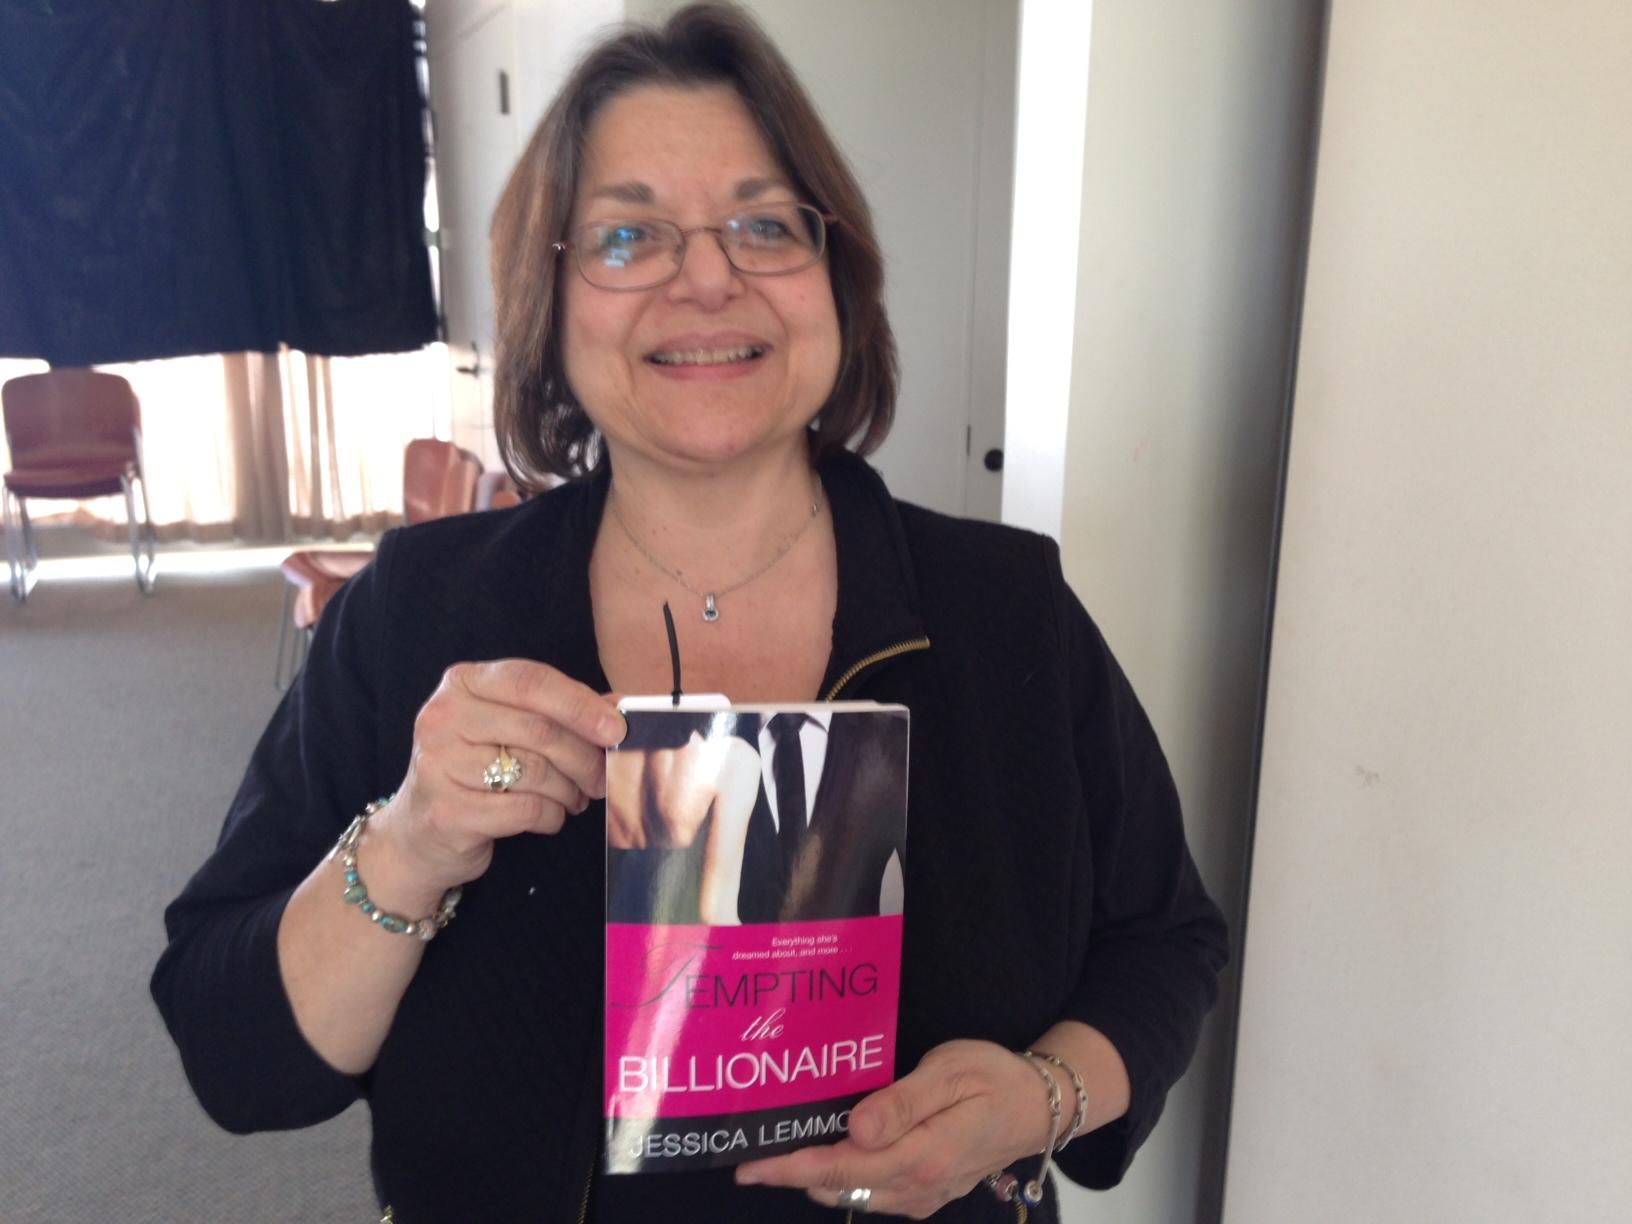 One of the ARC winners, Sandy Pennington!